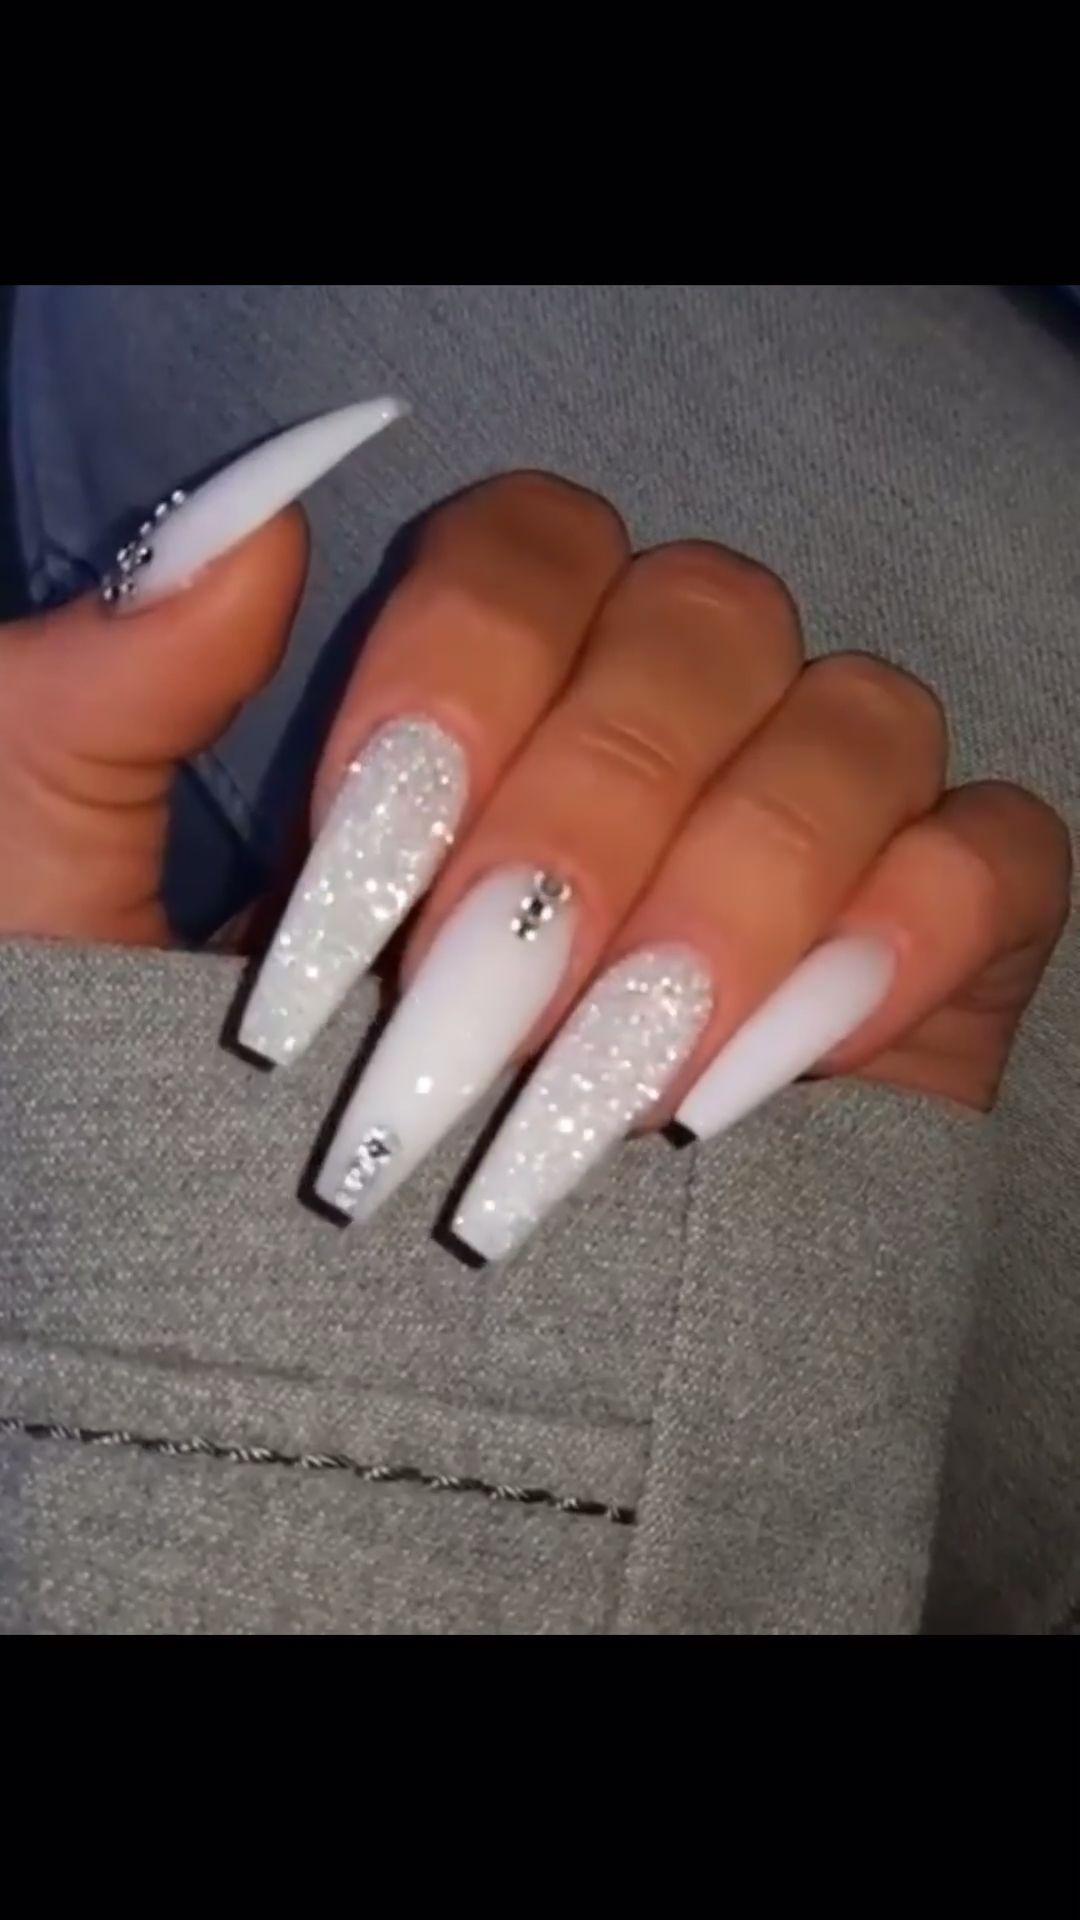 Pinterest Gxoxo Video Best Acrylic Nails Nails Design With Rhinestones White Acrylic Nails